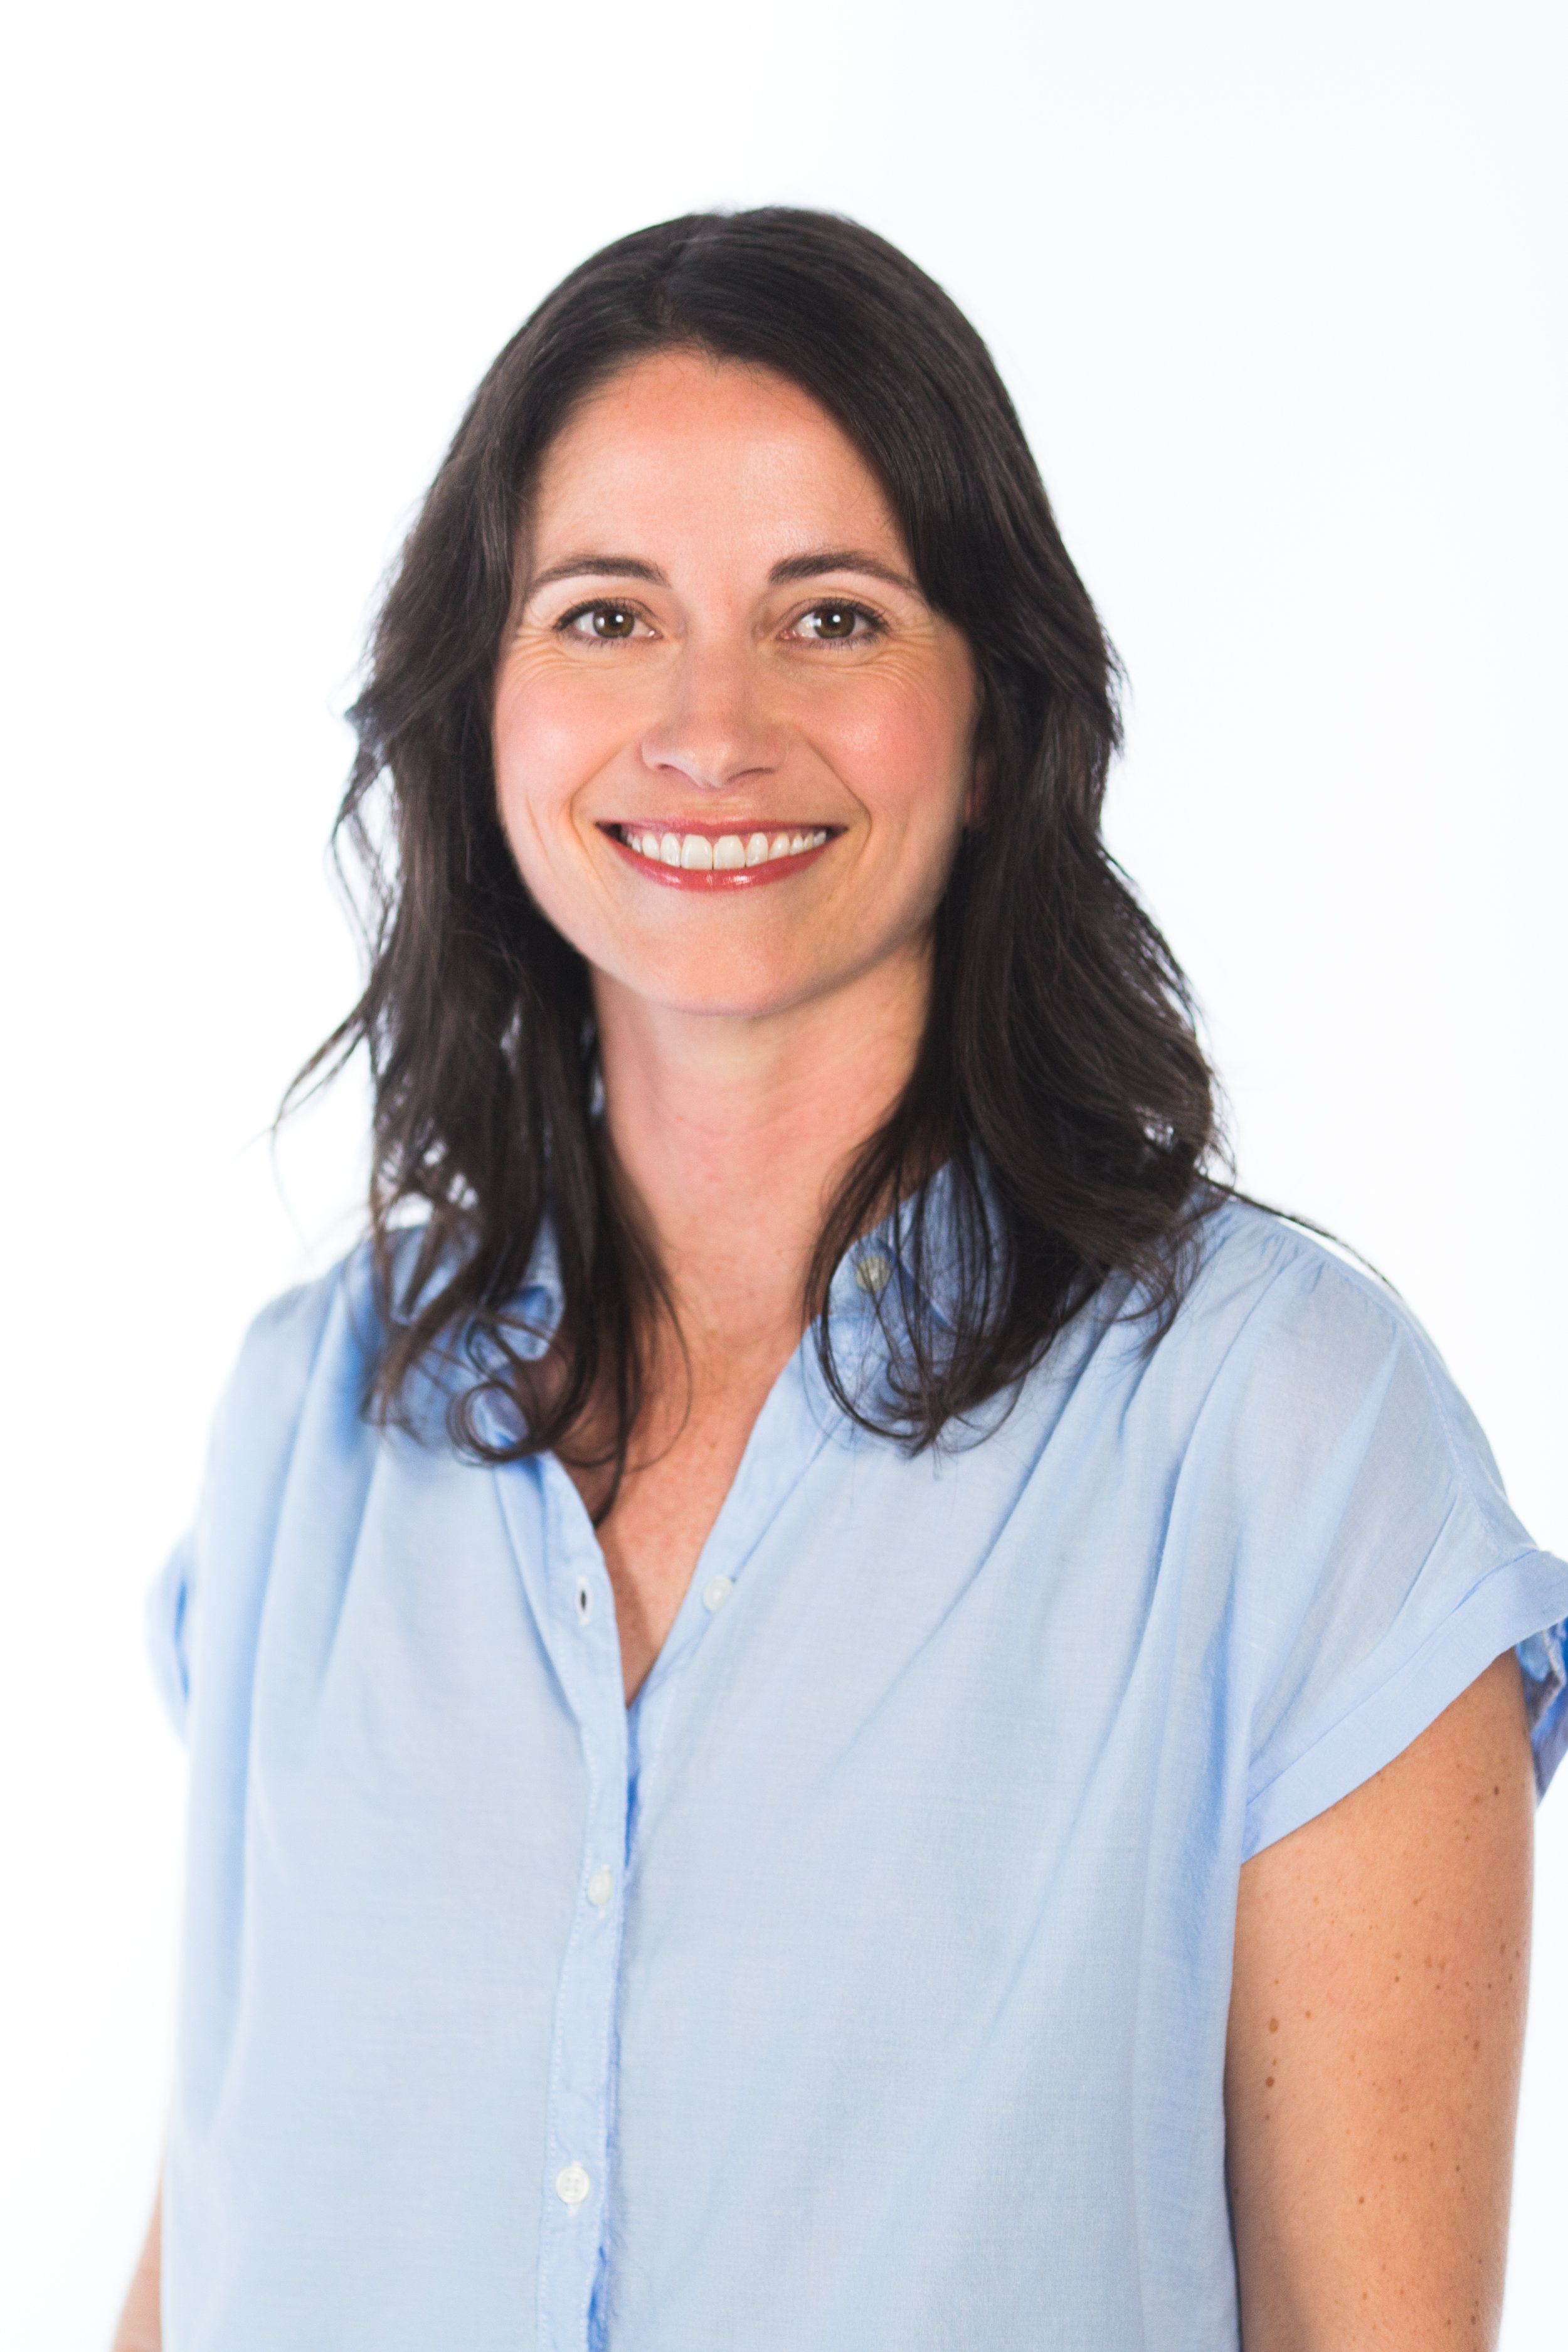 Sara Westbrook: Old Navy Head of Plus & Maternity Merchandising